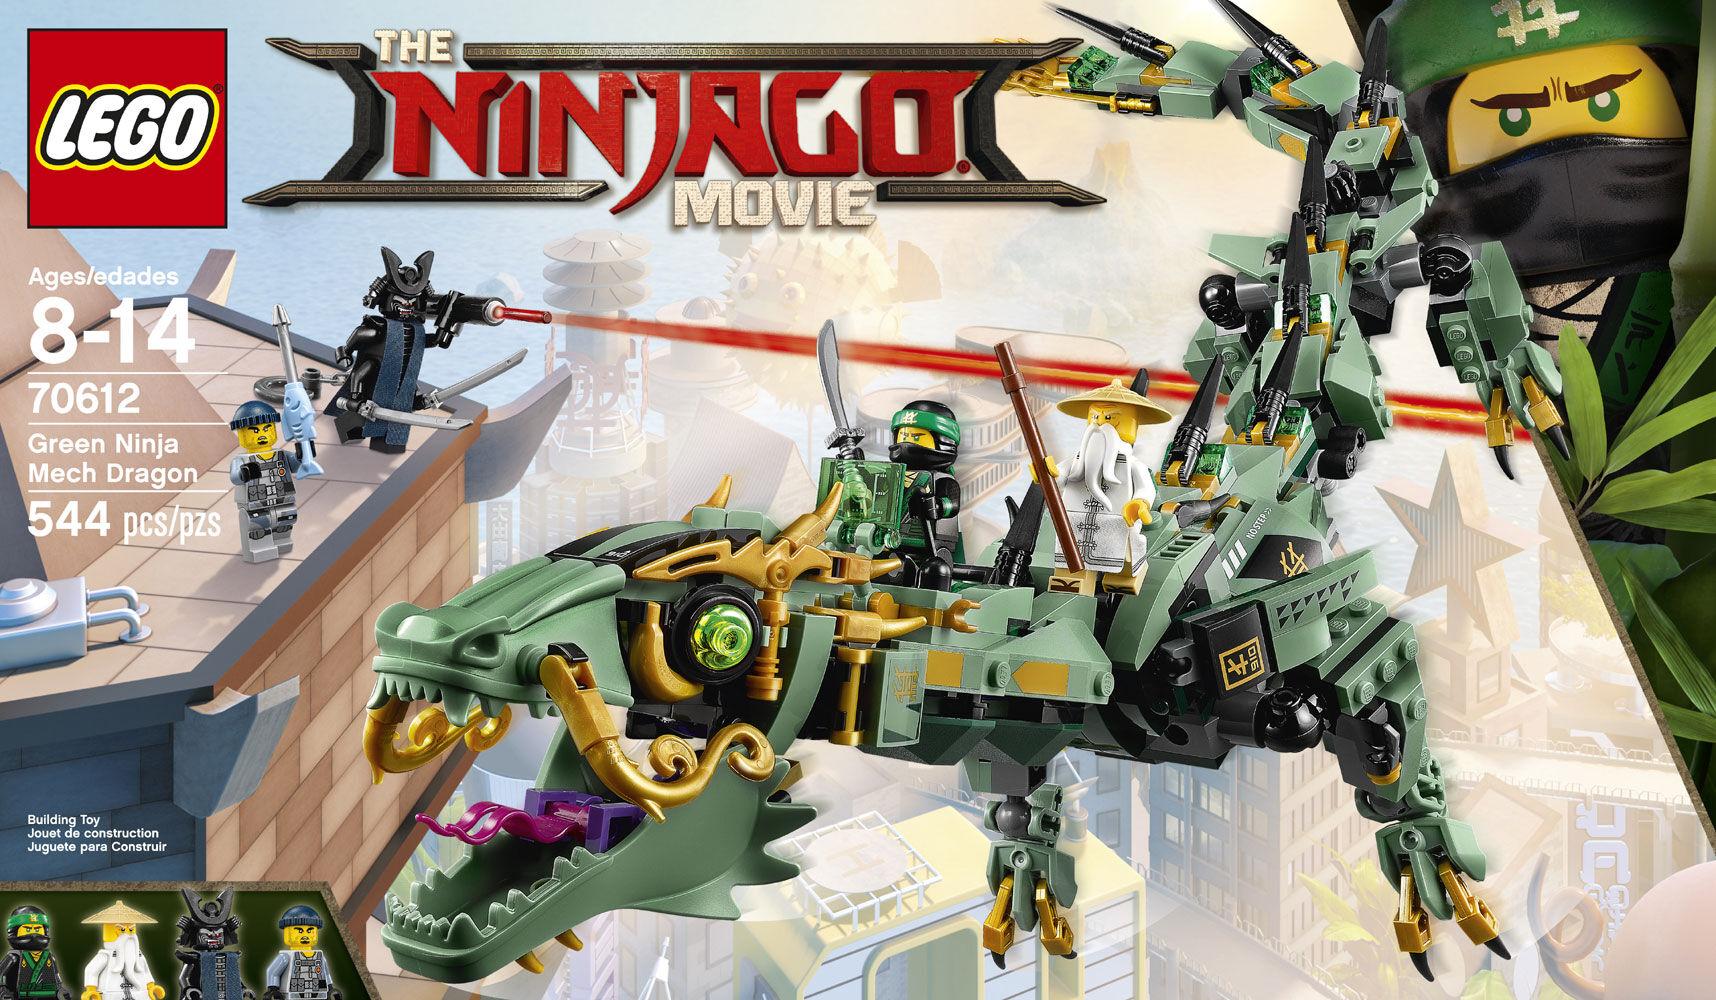 70612 Damaged Box LEGO Ninjago Movie Green Ninja Mech Dragon